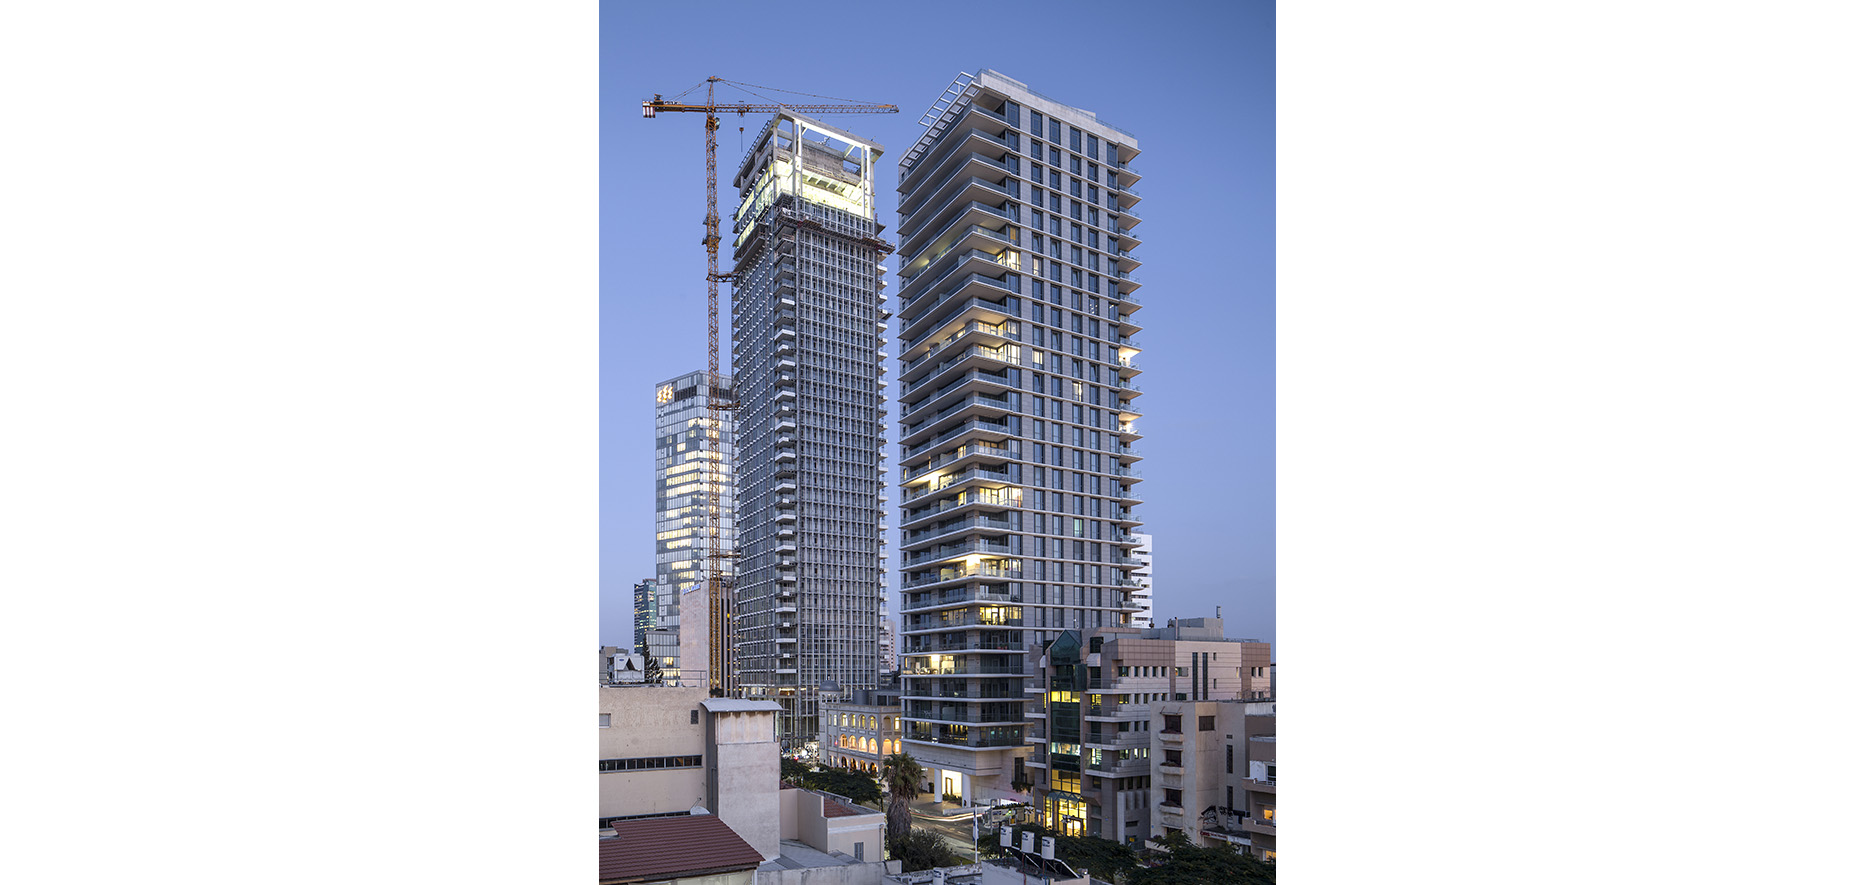 Rothschild_30_Tower_Tel_Aviv_planned_By_Kolker_Epstein_Architects8